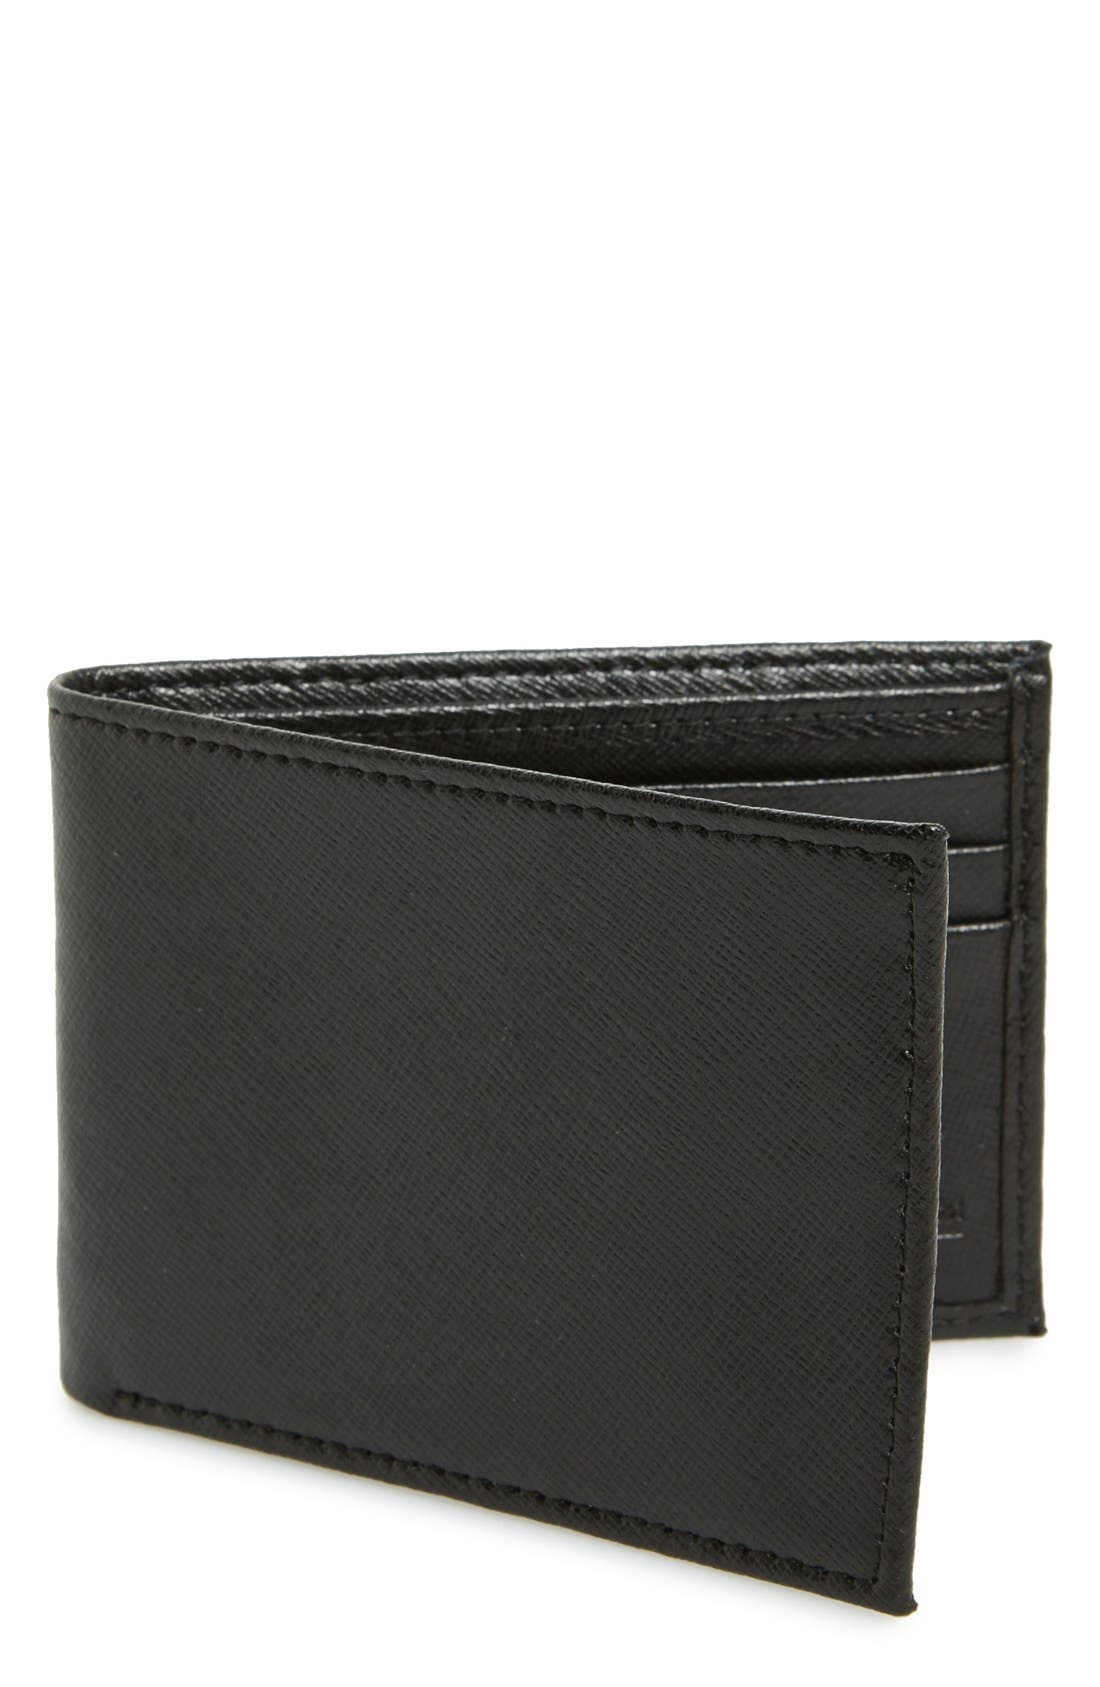 Main Image - Nordstrom Men's Shop Large Saffiano Leather Bifold Wallet